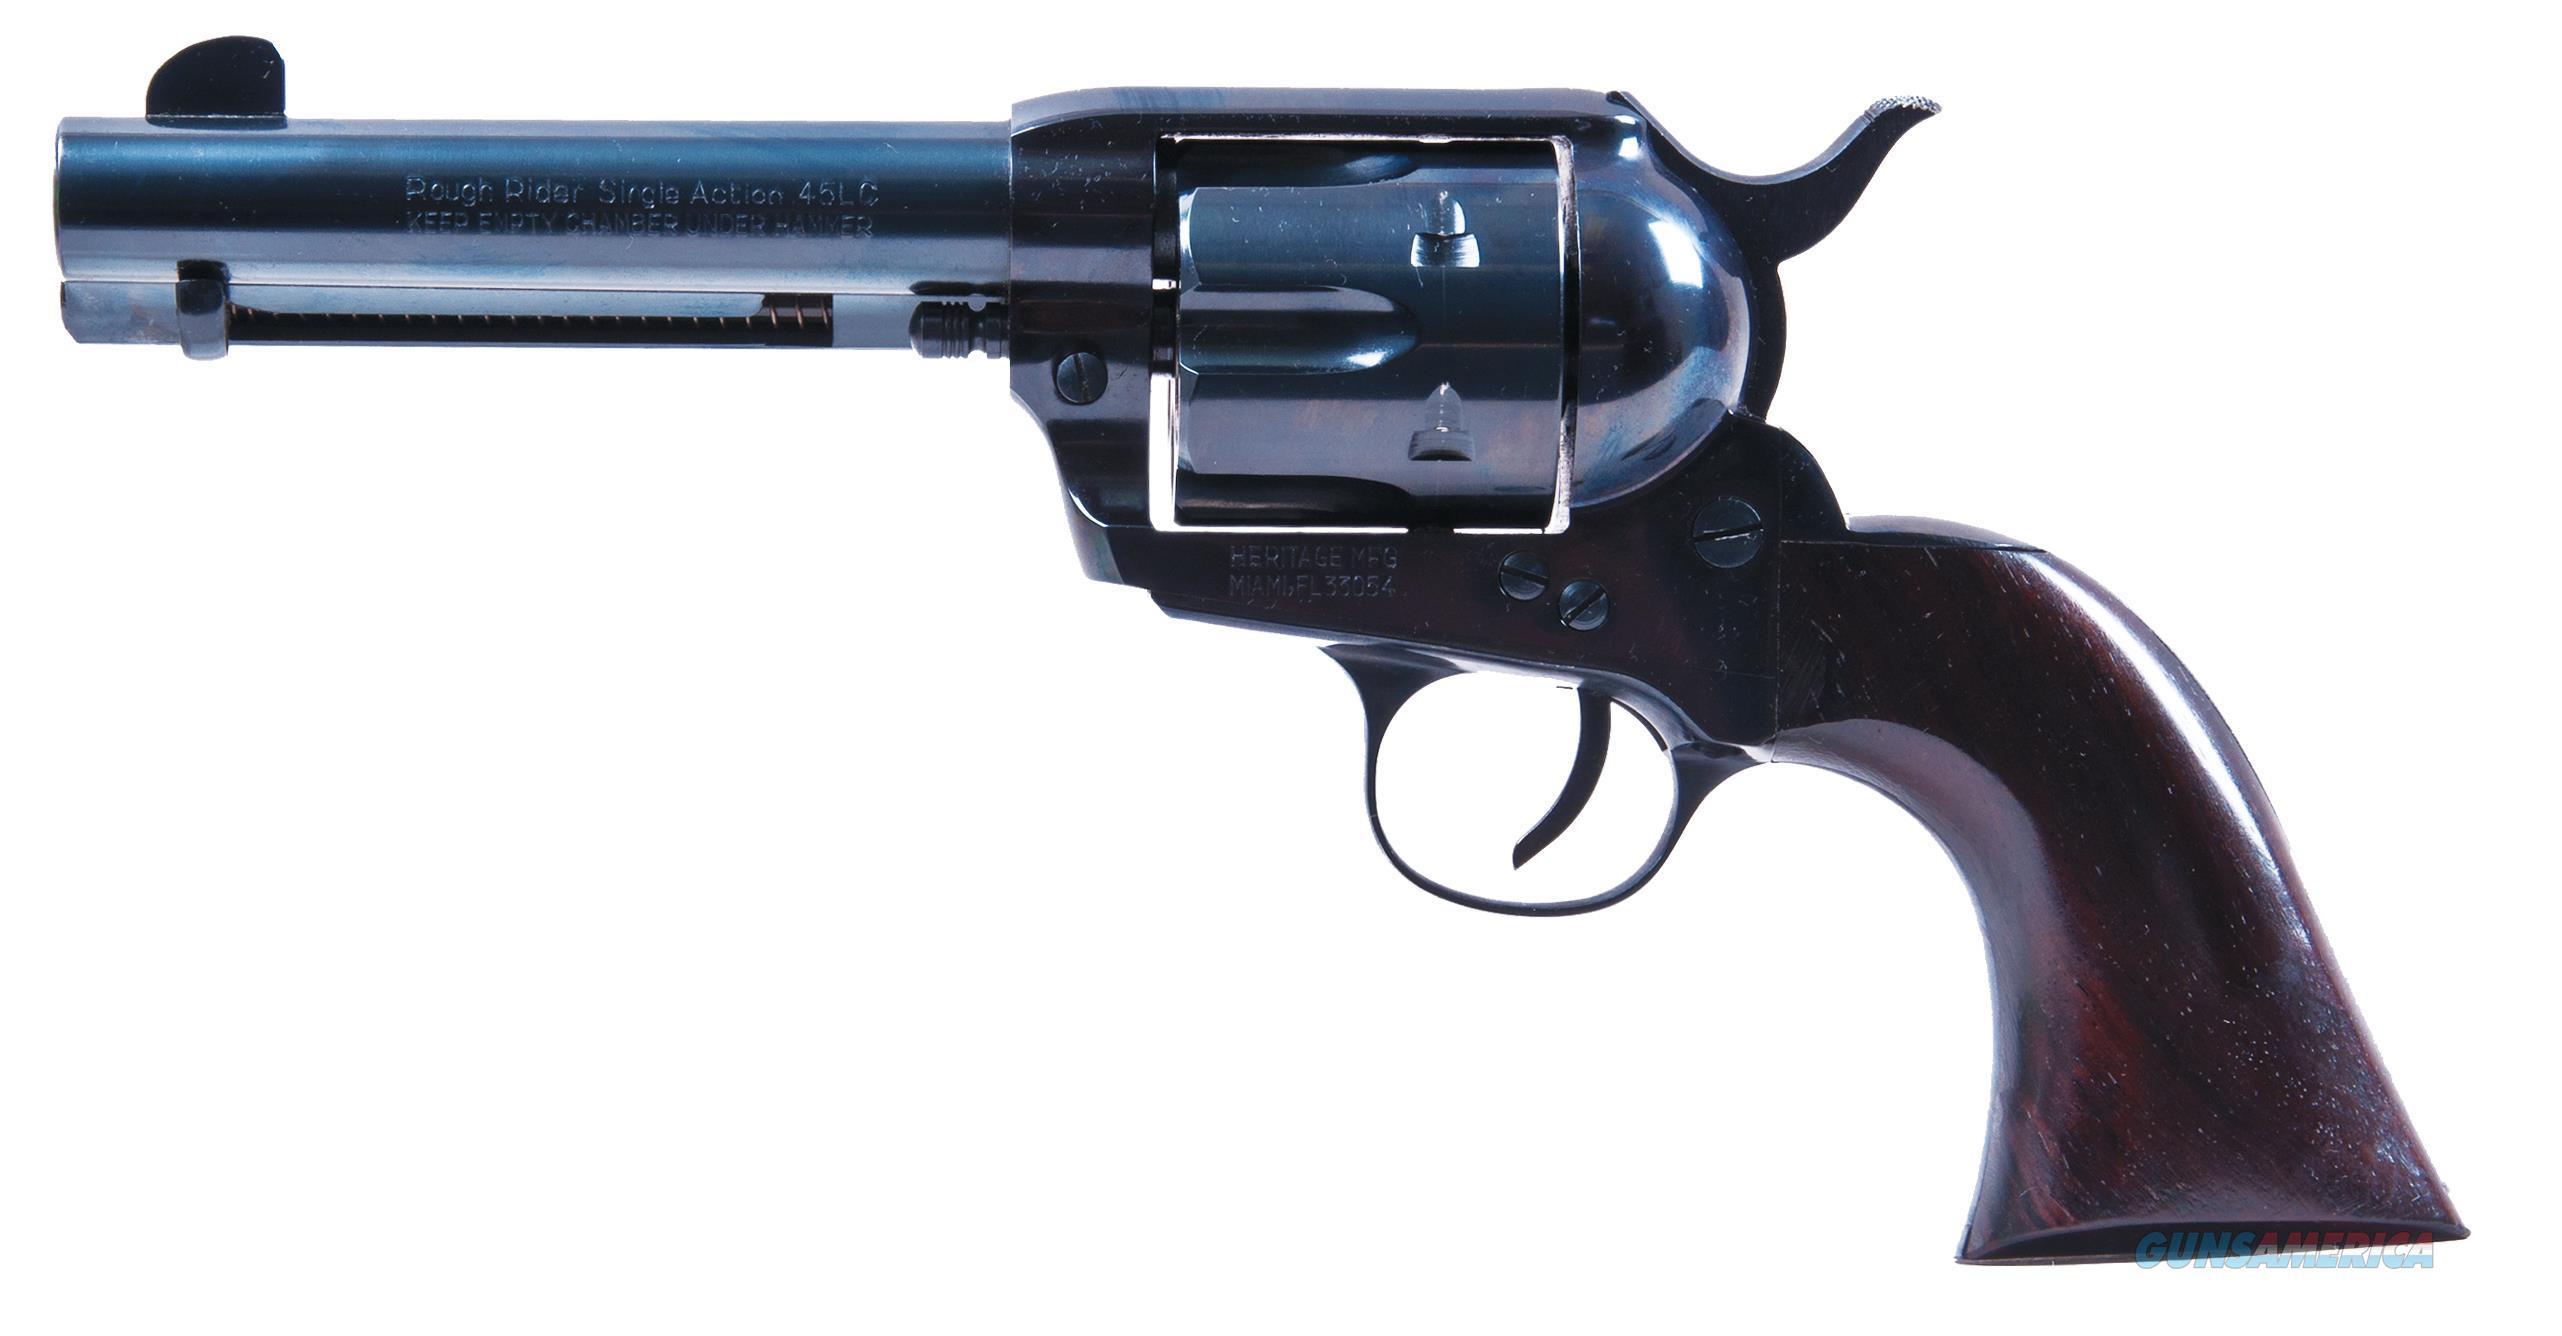 "Heritage Mfg Rr45b4 Rough Rider Big Bore Single 45 Colt (Lc) 4.75"" 6 Cocobolo Blued RR45B4  Guns > Pistols > Heritage"